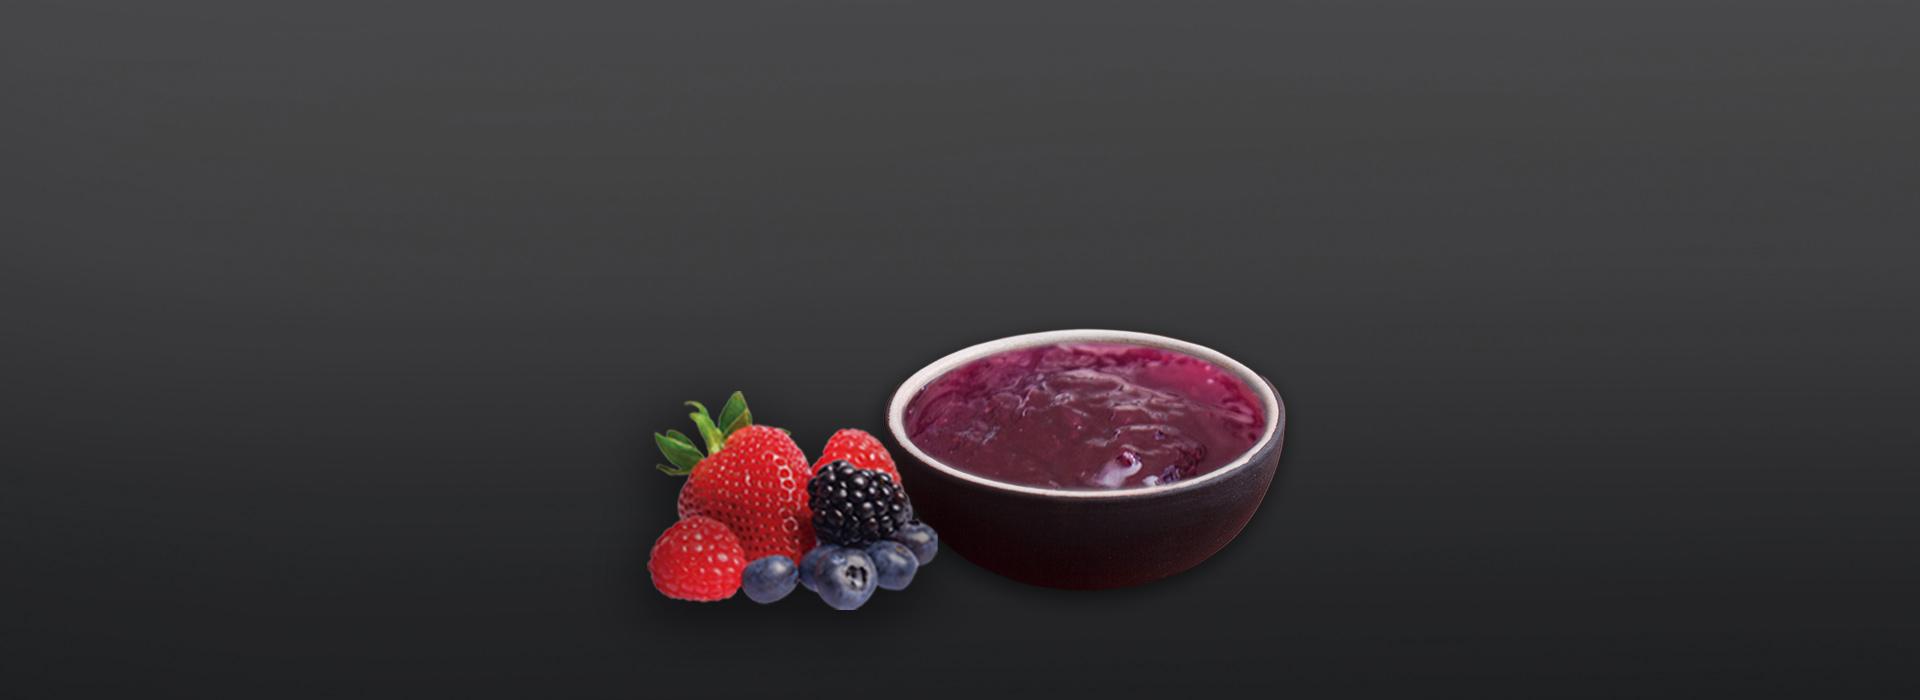 sraml-berry-puree